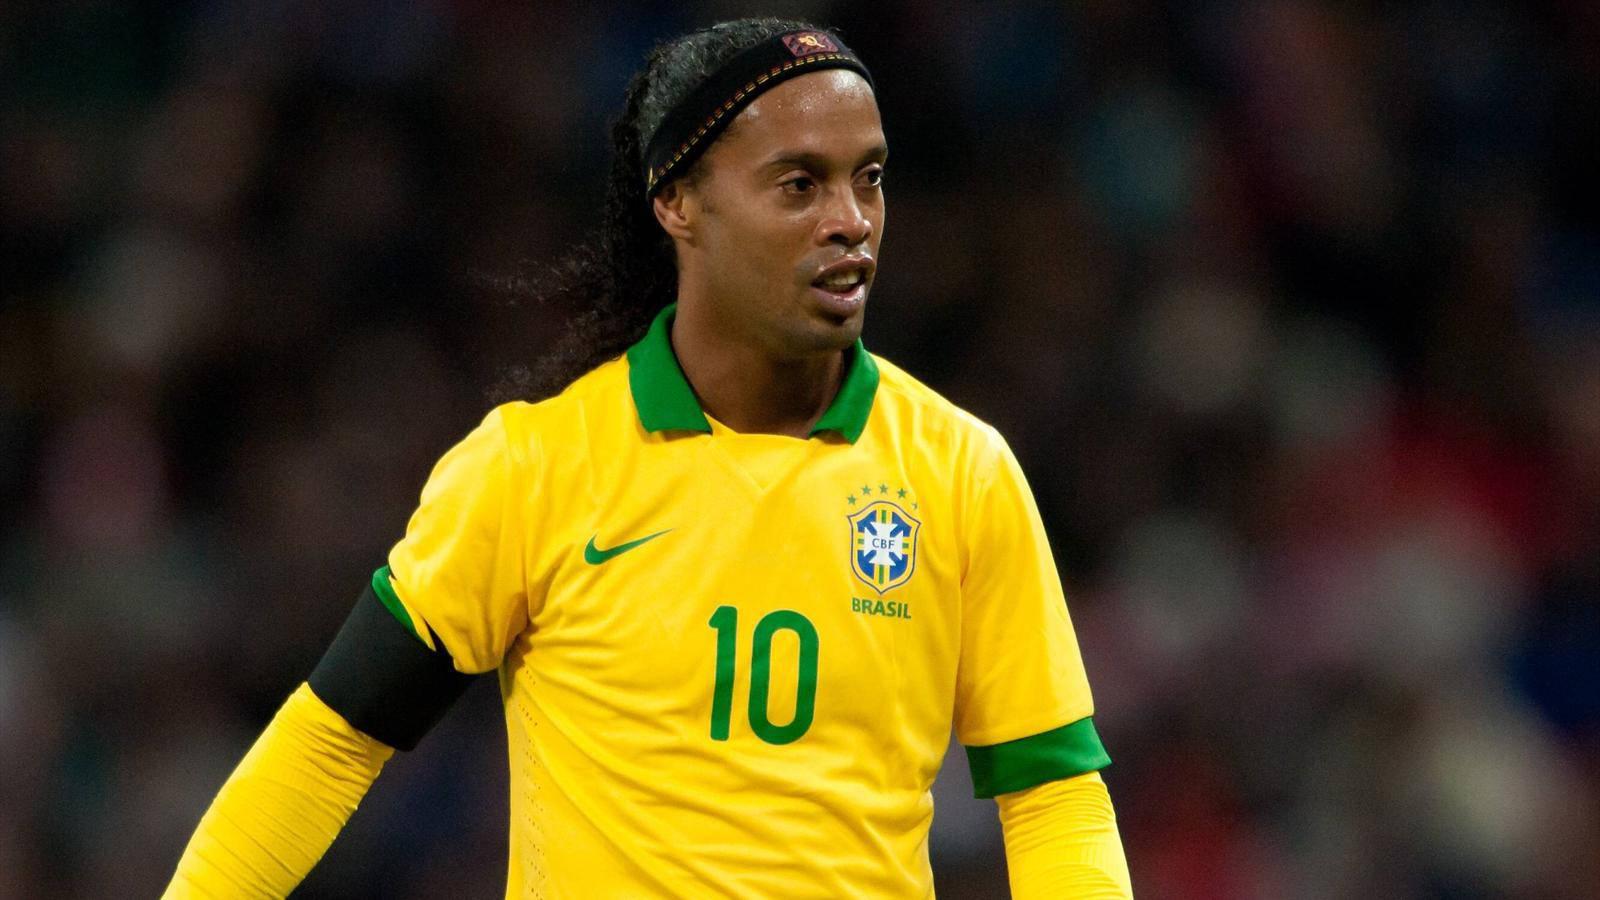 ronaldinho, dice addio al calcio